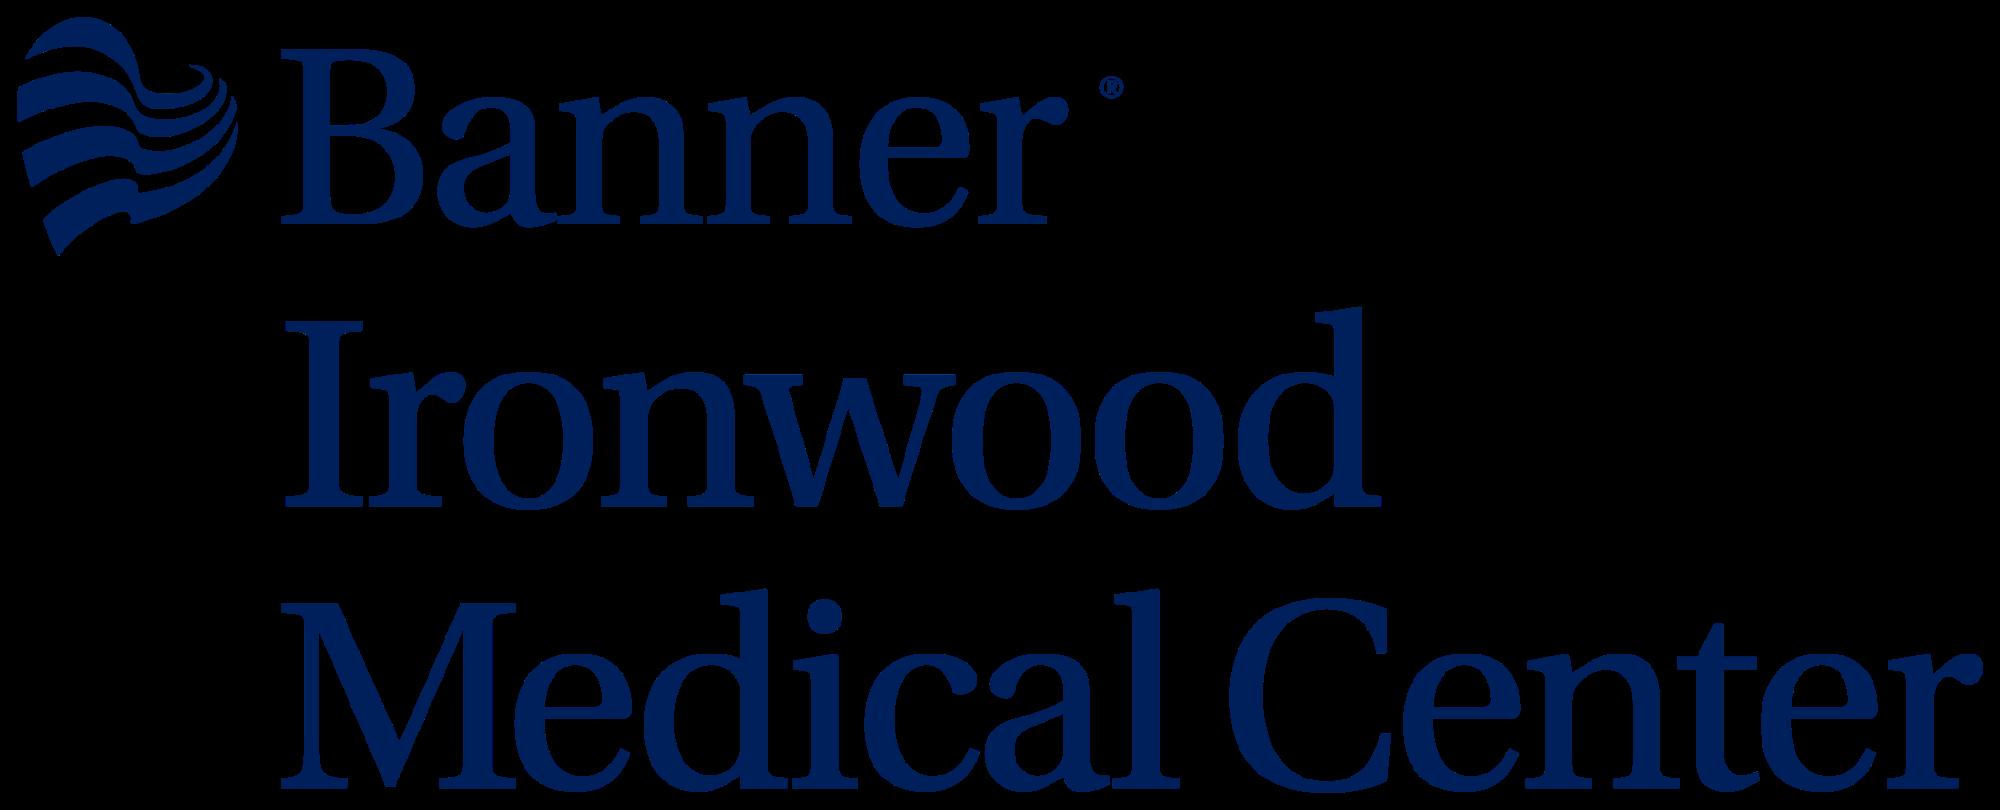 Banner Ironwood Medical Center logo PMS 281